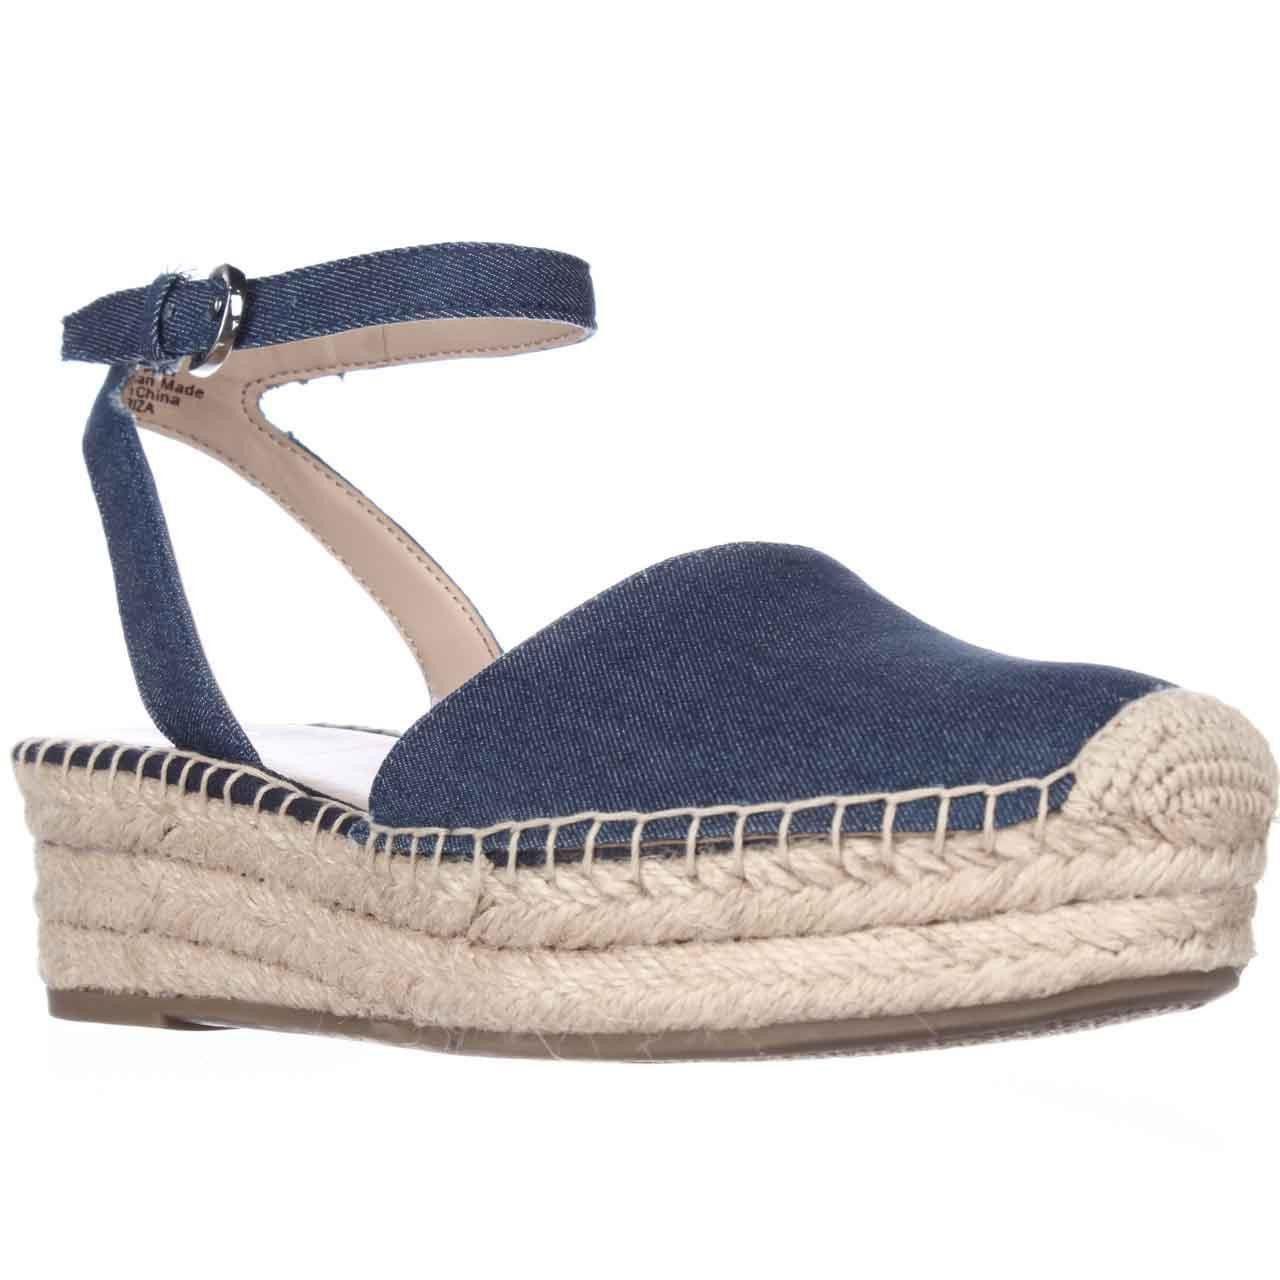 Franco Sarto Lariza Espadrille Wedge Platform Sandals - Blue Jeans